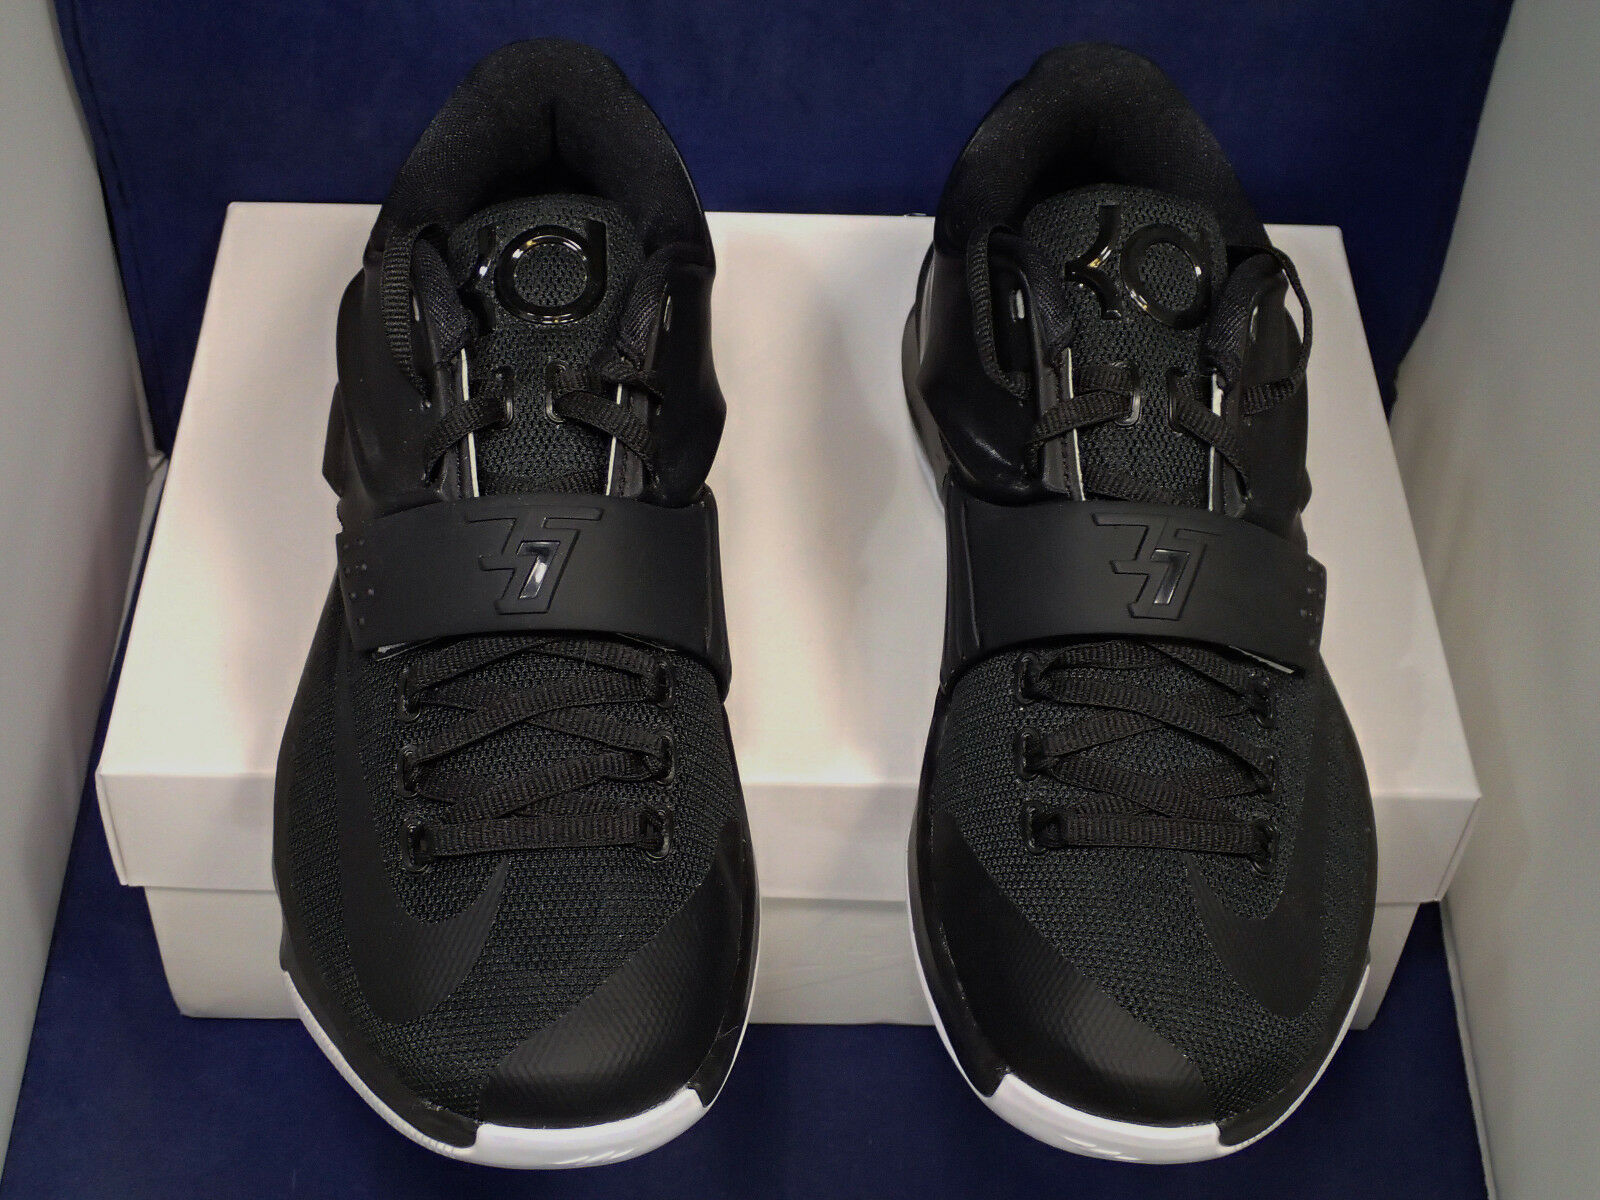 2015 Nike Kd VII VII VII Identifikation Schwarz Weiß Kevin Durant Sz Us 7 (704380-981) ae1ed3